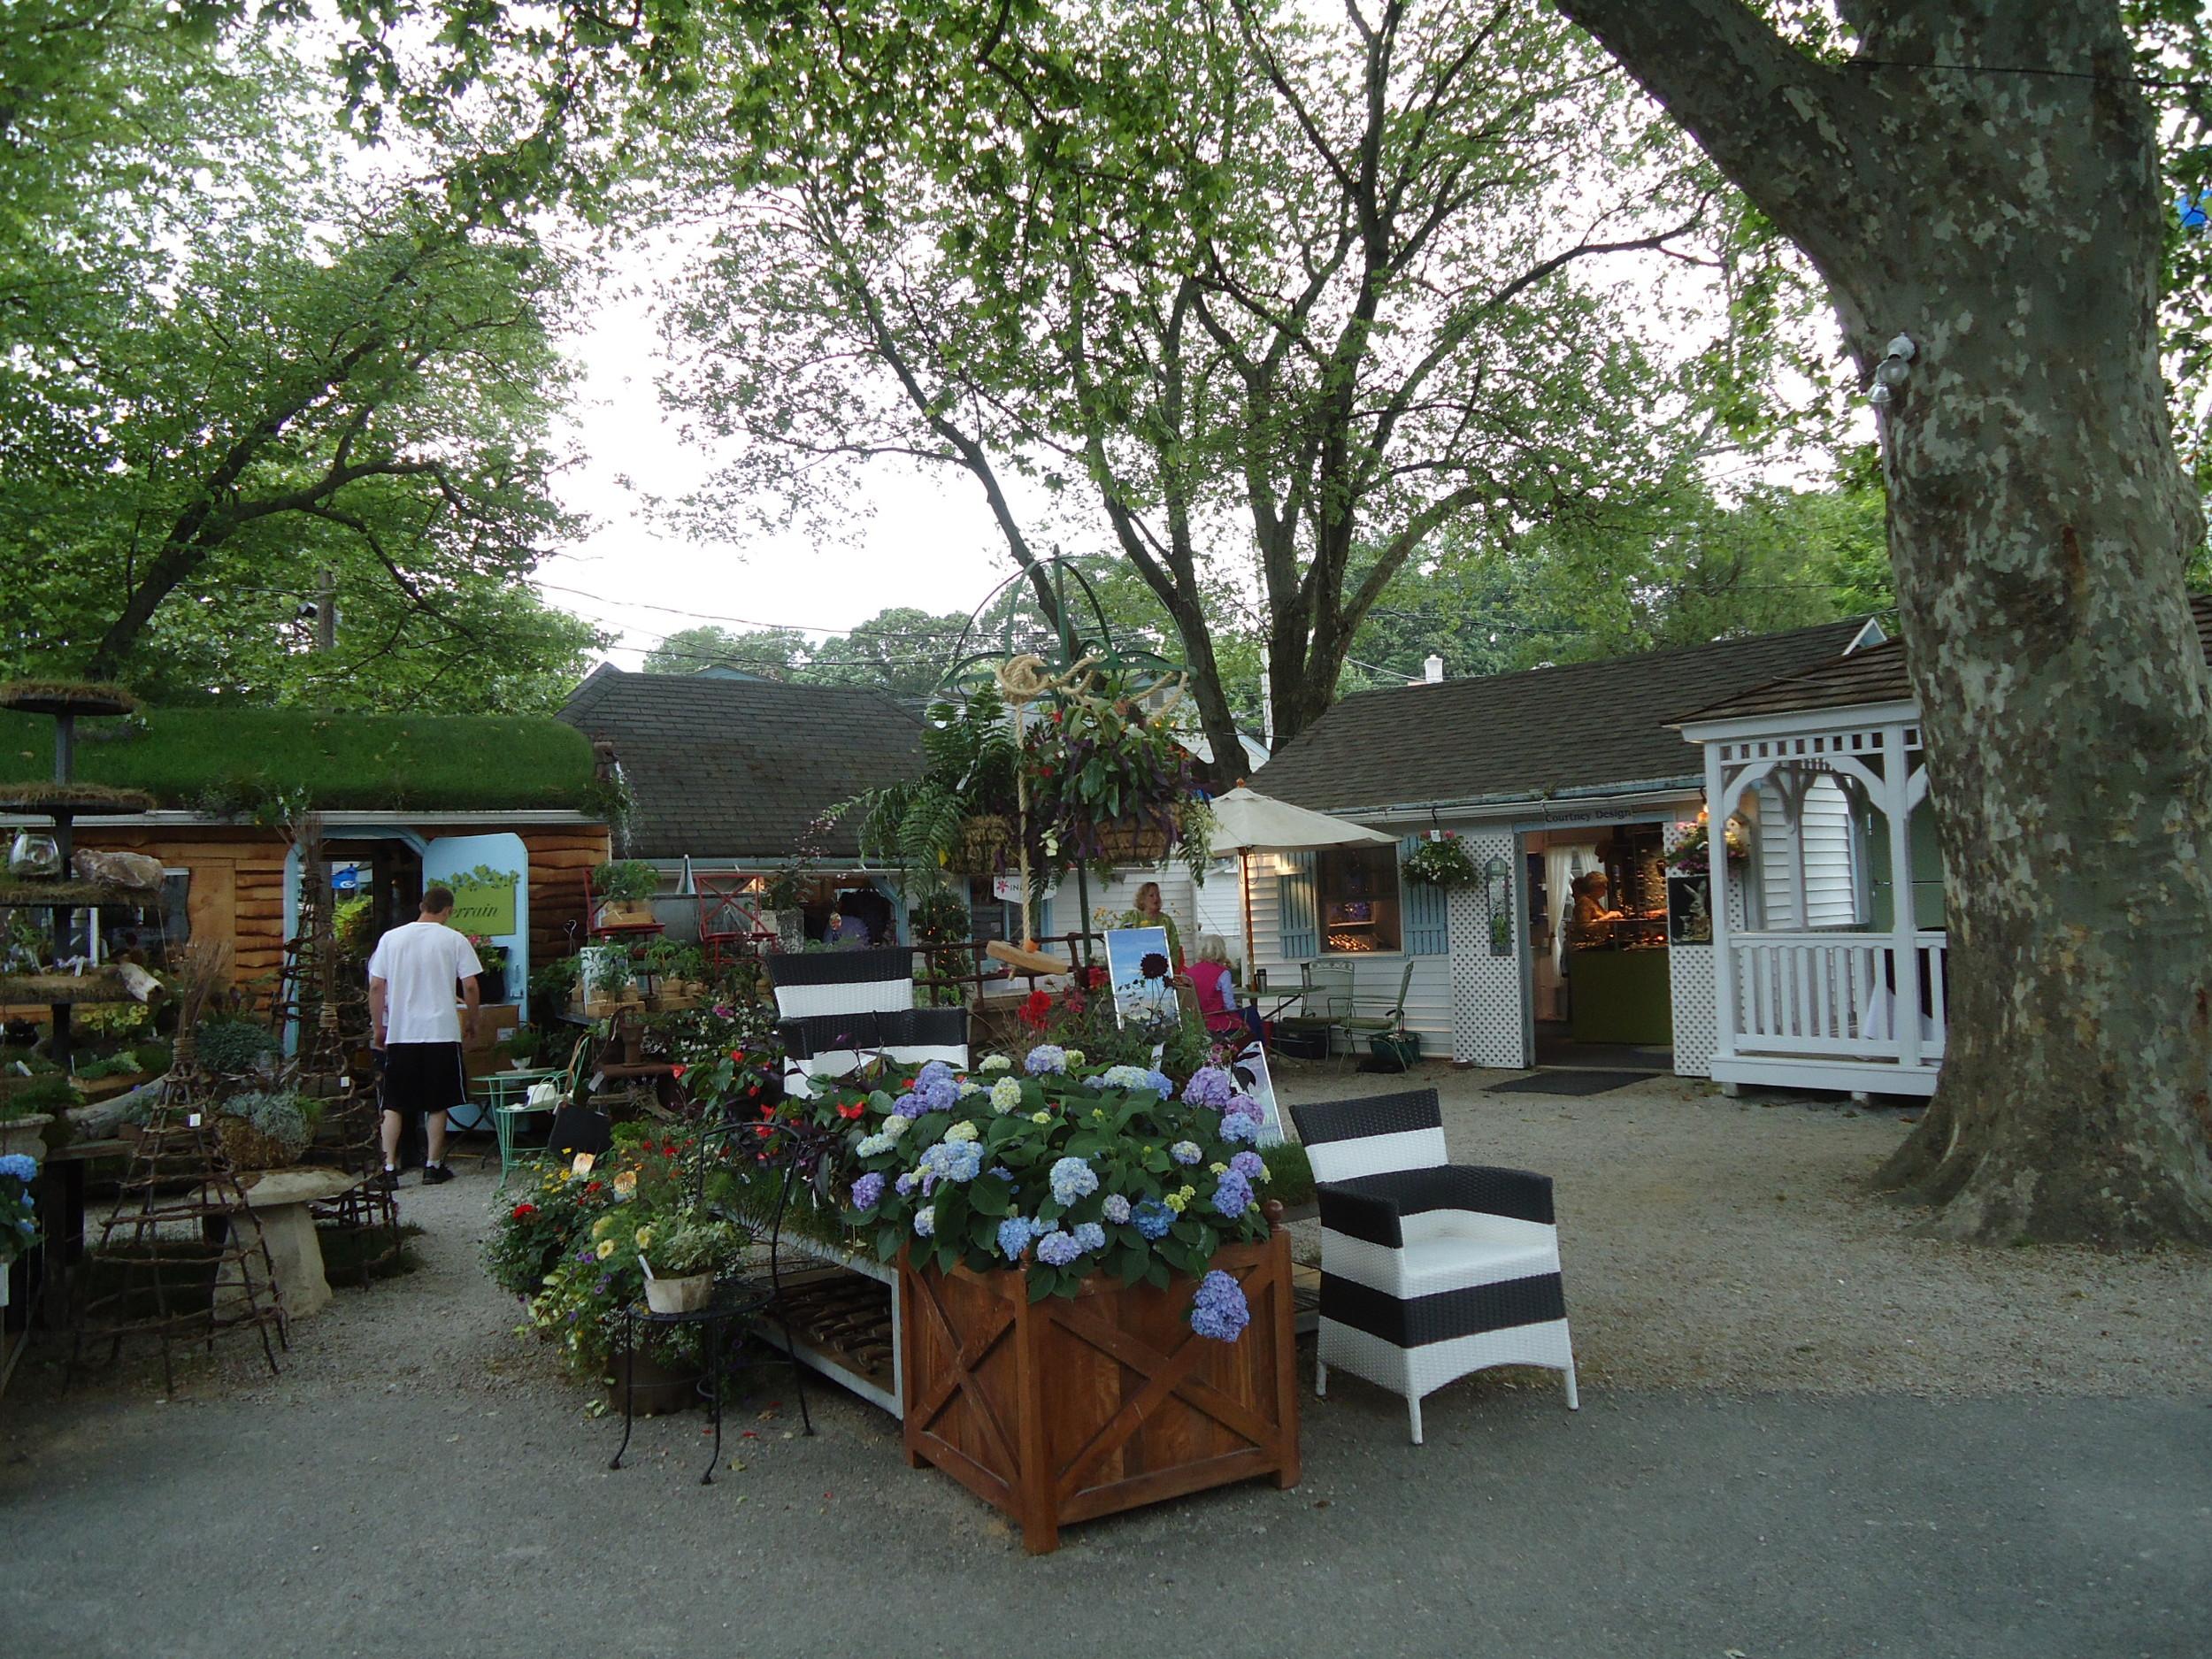 Devon Shops at the Country Fair